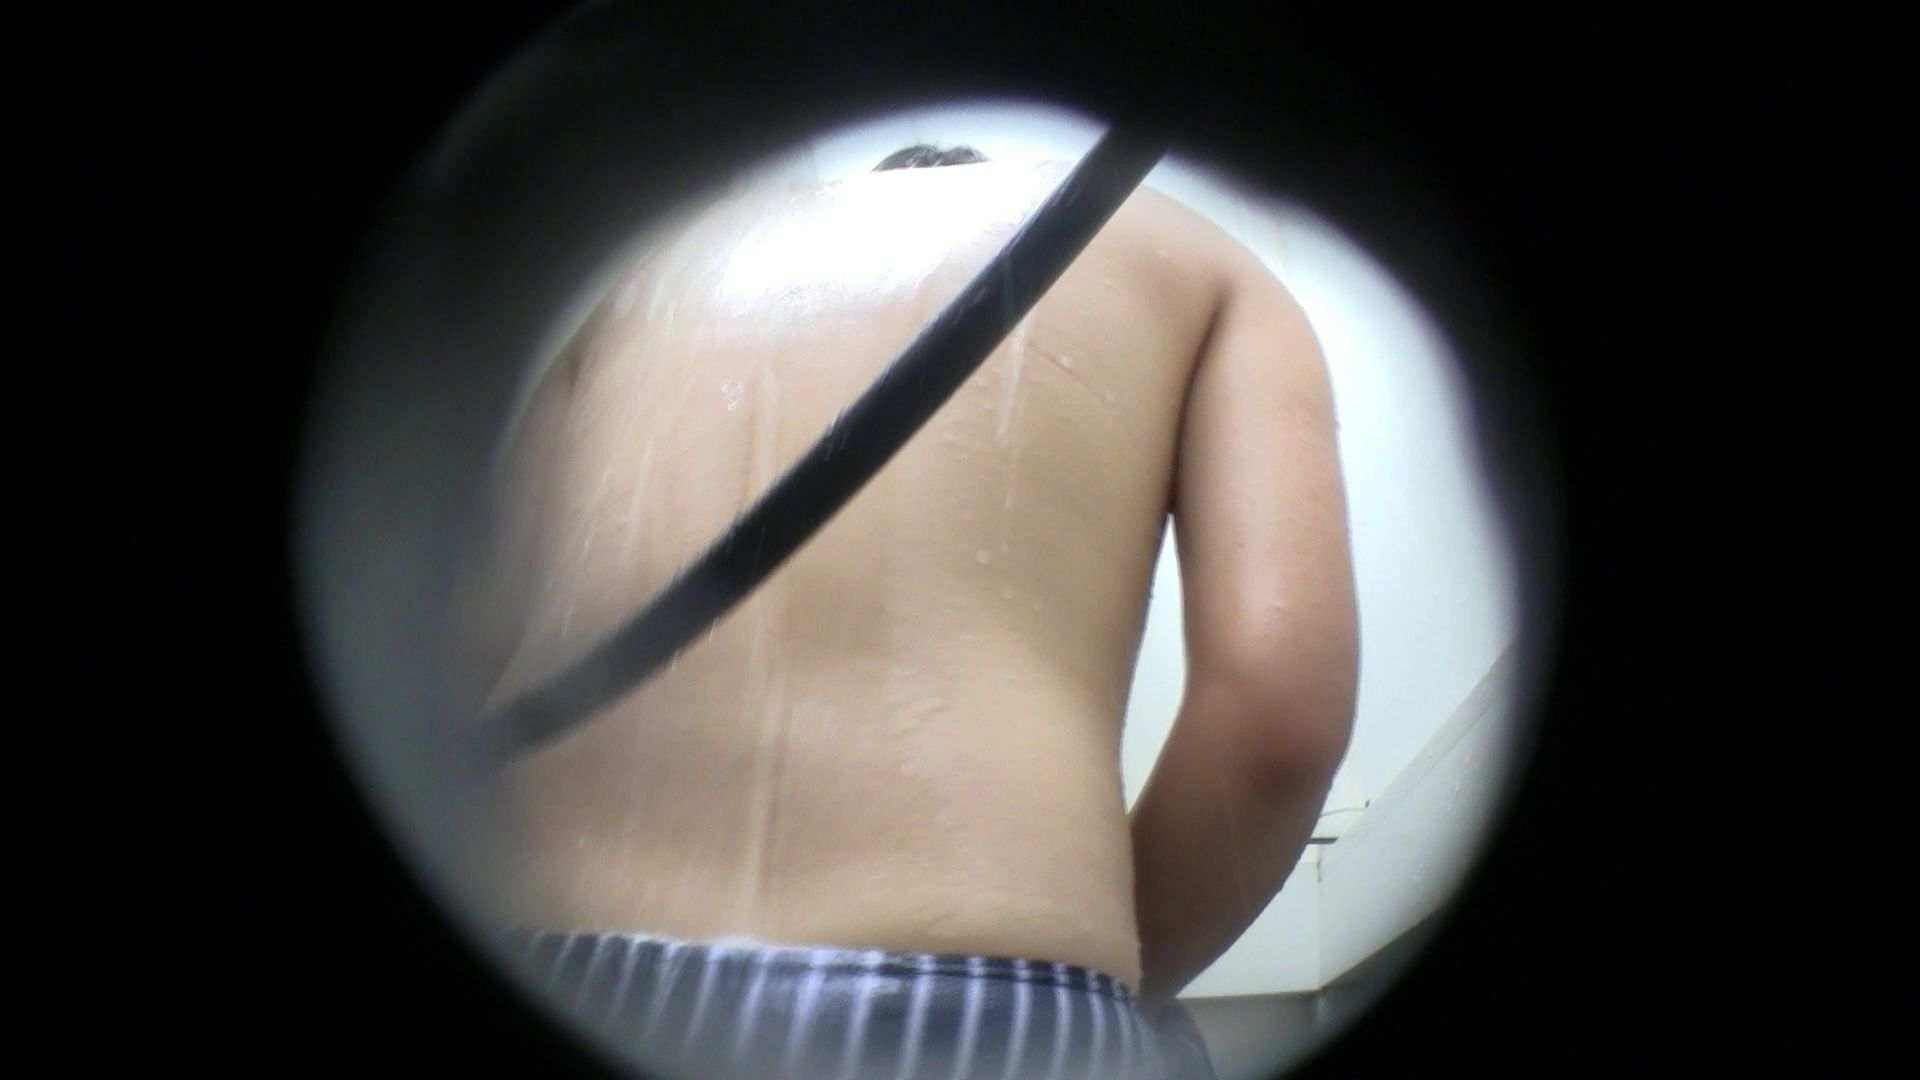 NO.43 乳首の先がチラ 背中でイメージして下さい いろんな乳首 セックス画像 83枚 47